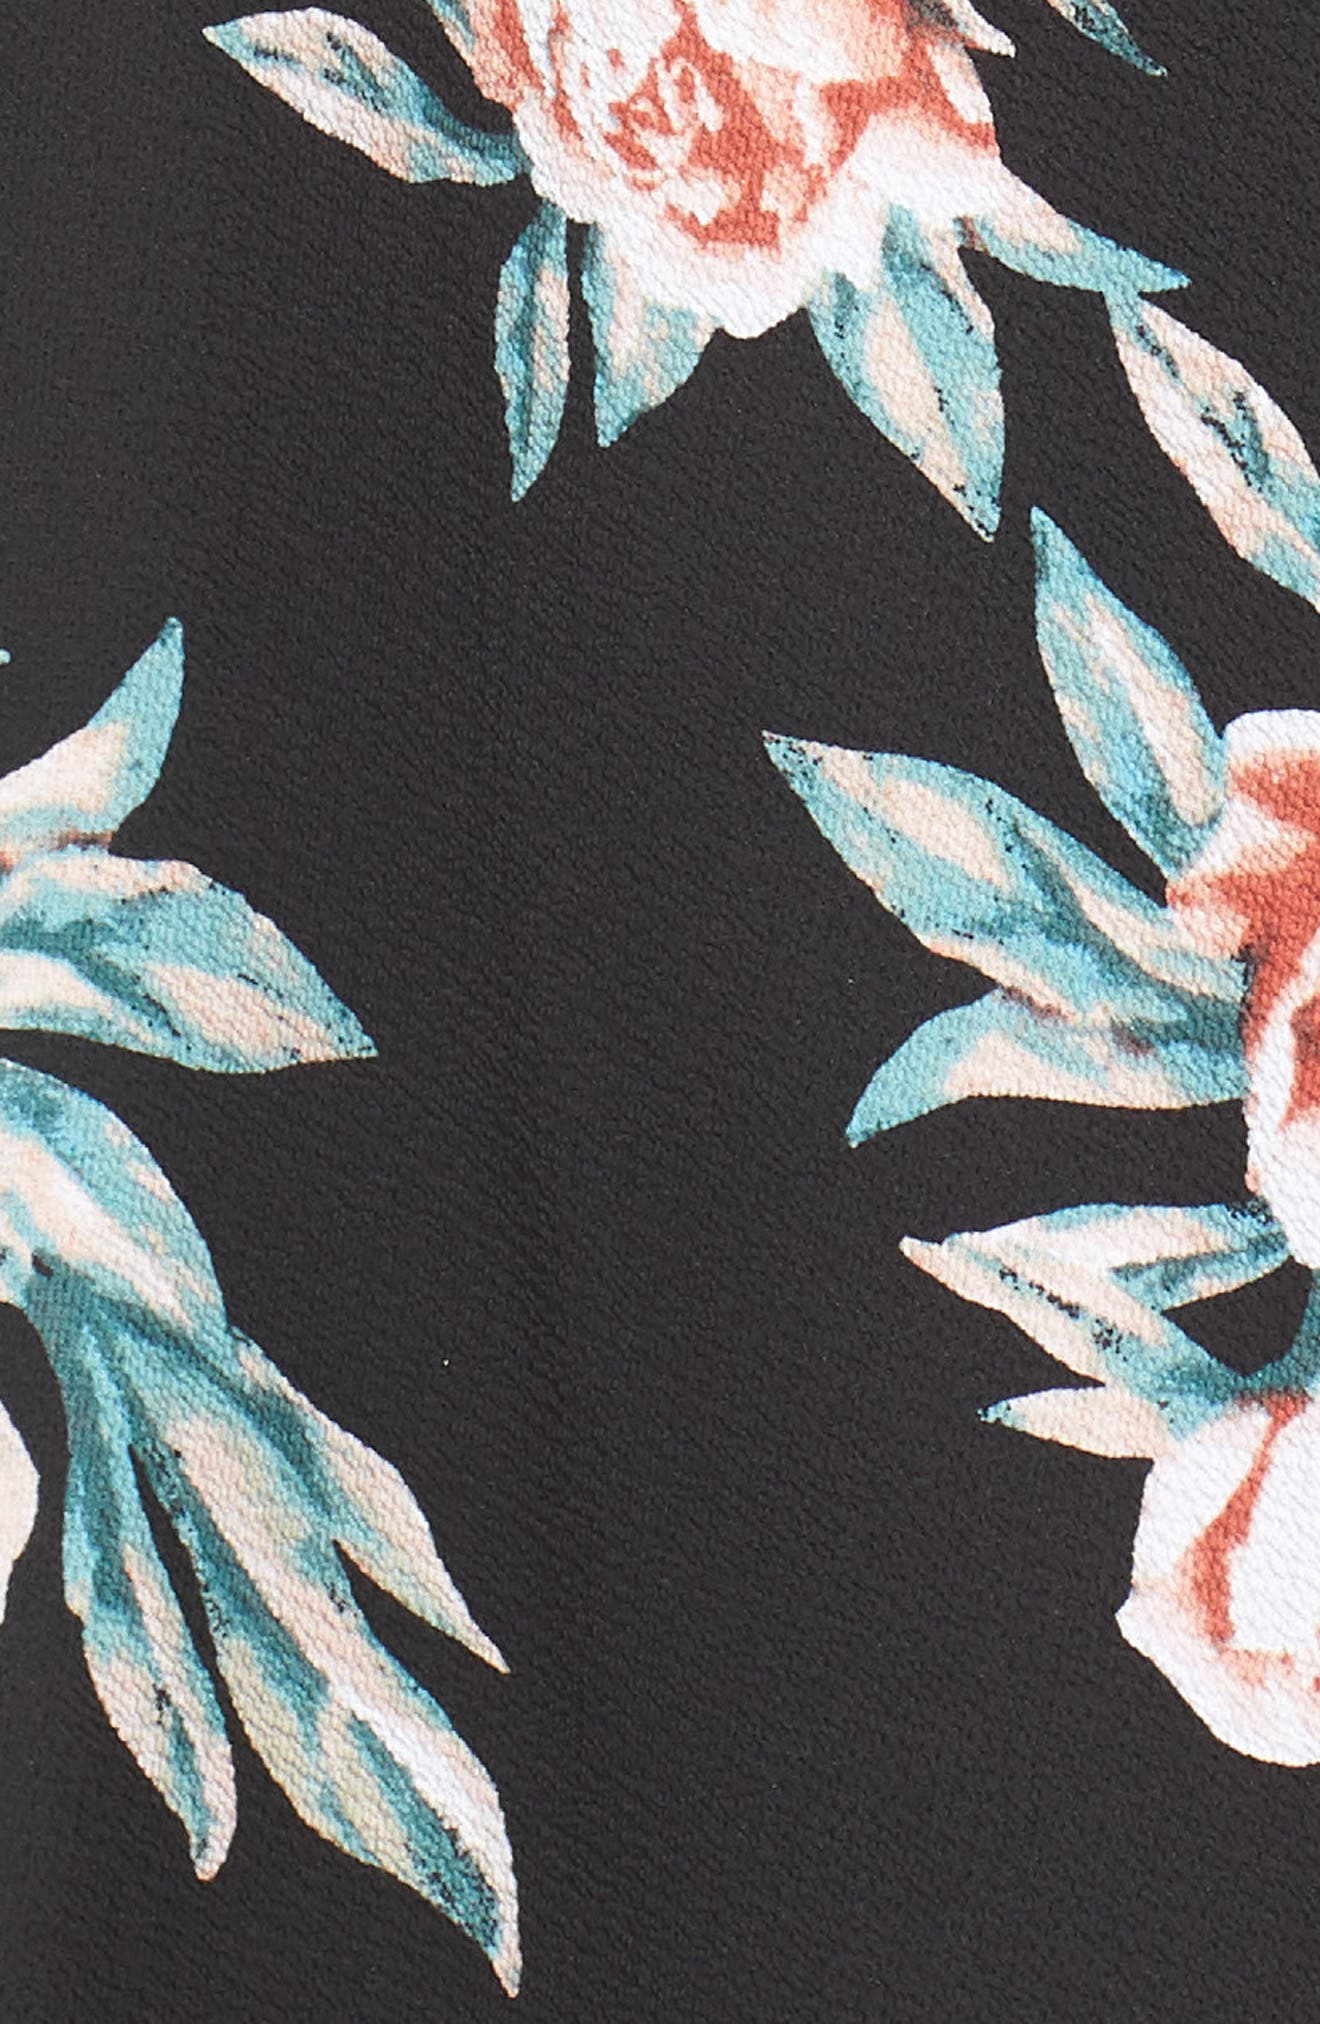 Ruffle Sleeve Floral Maxi Dress,                             Alternate thumbnail 3, color,                             Black Floral